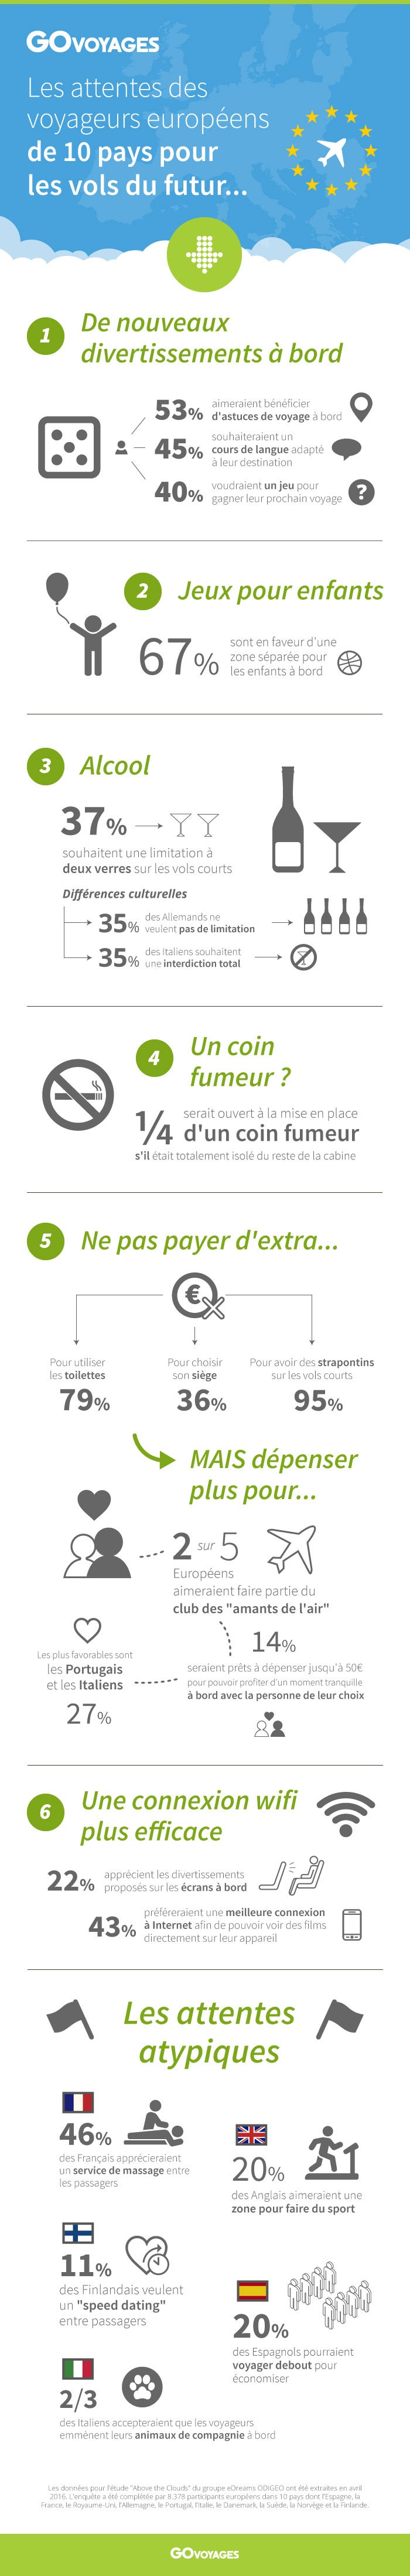 infographie GO future of travel